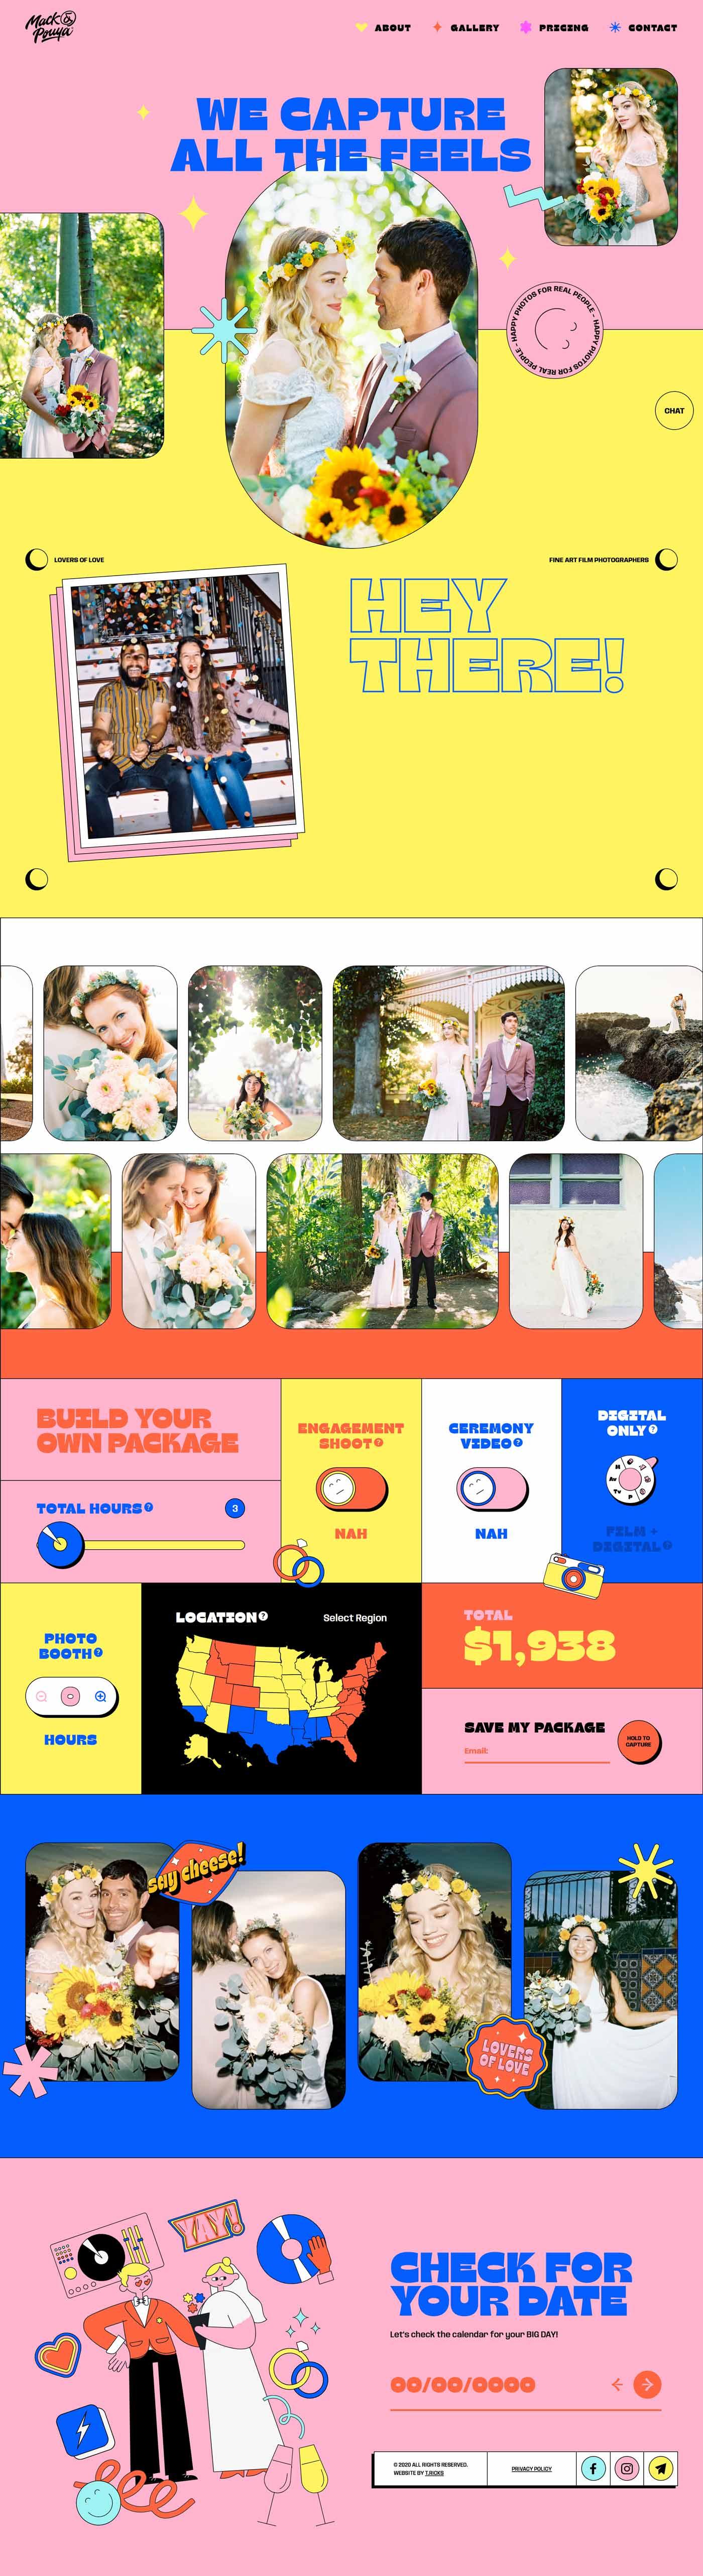 Mack & Pouya website - mackandpouya.com - Full screenshot